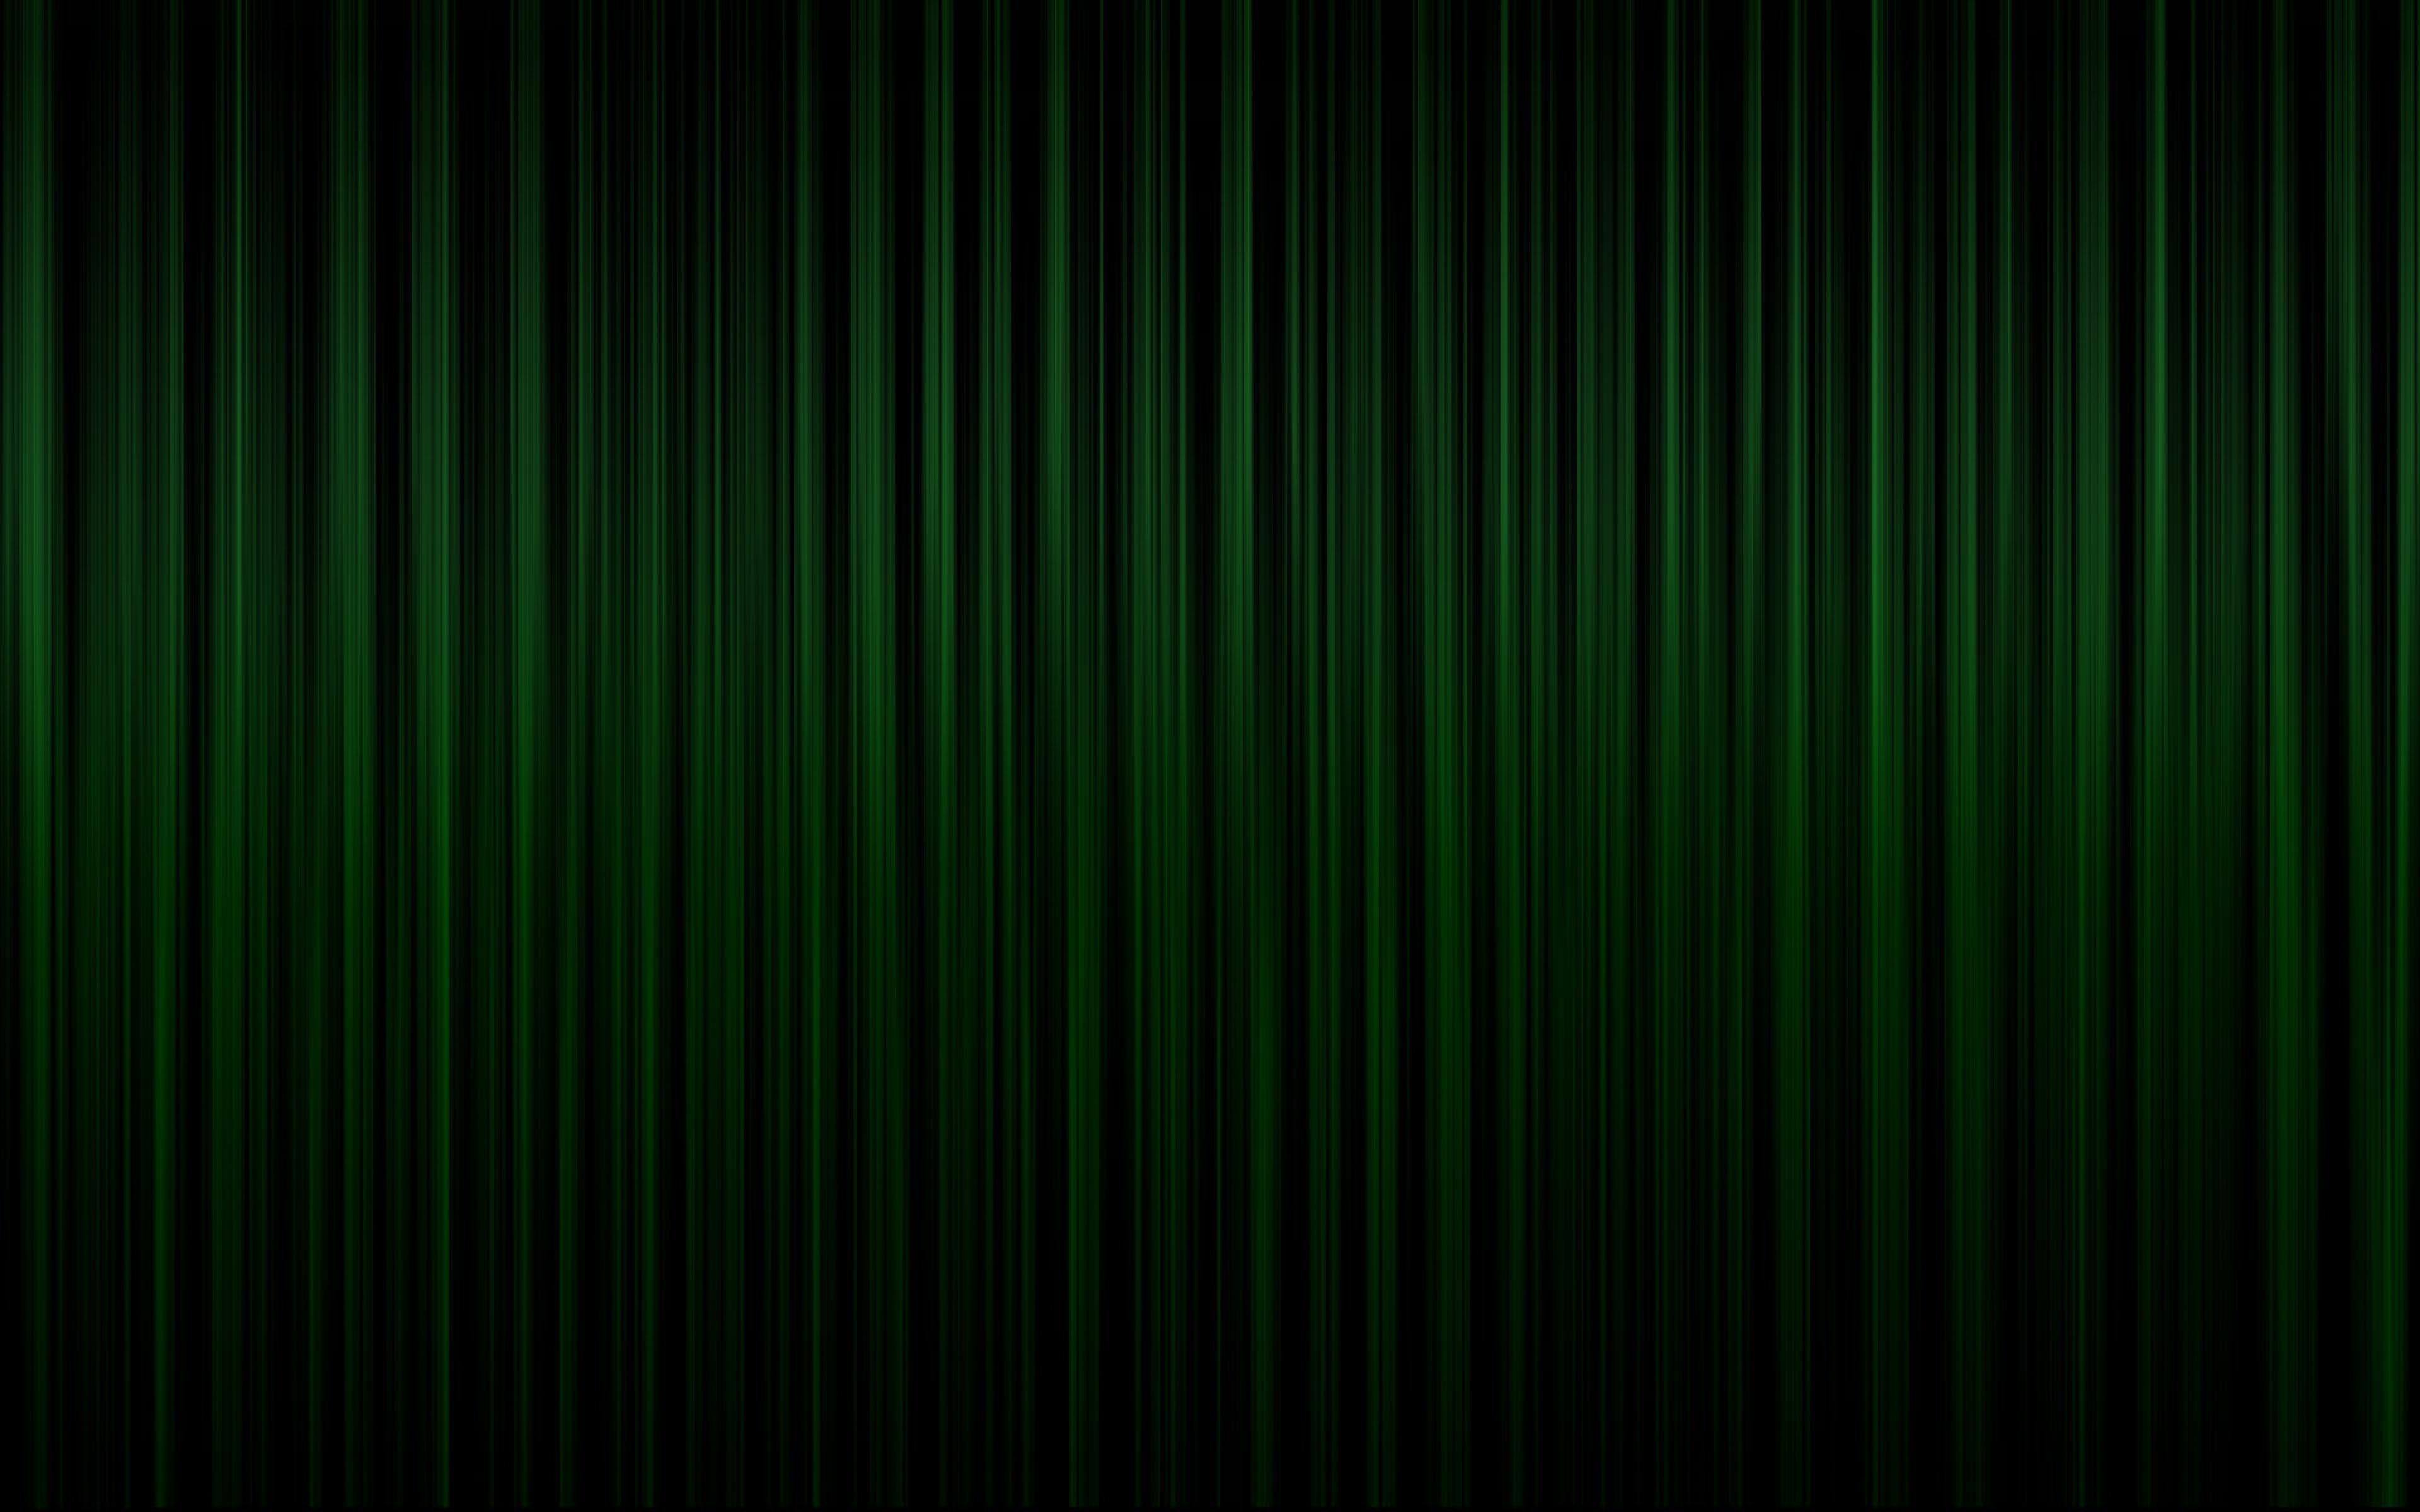 vertical wallpapers 4k abstract dark verde oscuro fondo pantalla texture lines wallpapersafari stripes shadow swirls ultra fondos multicolor lights brightness